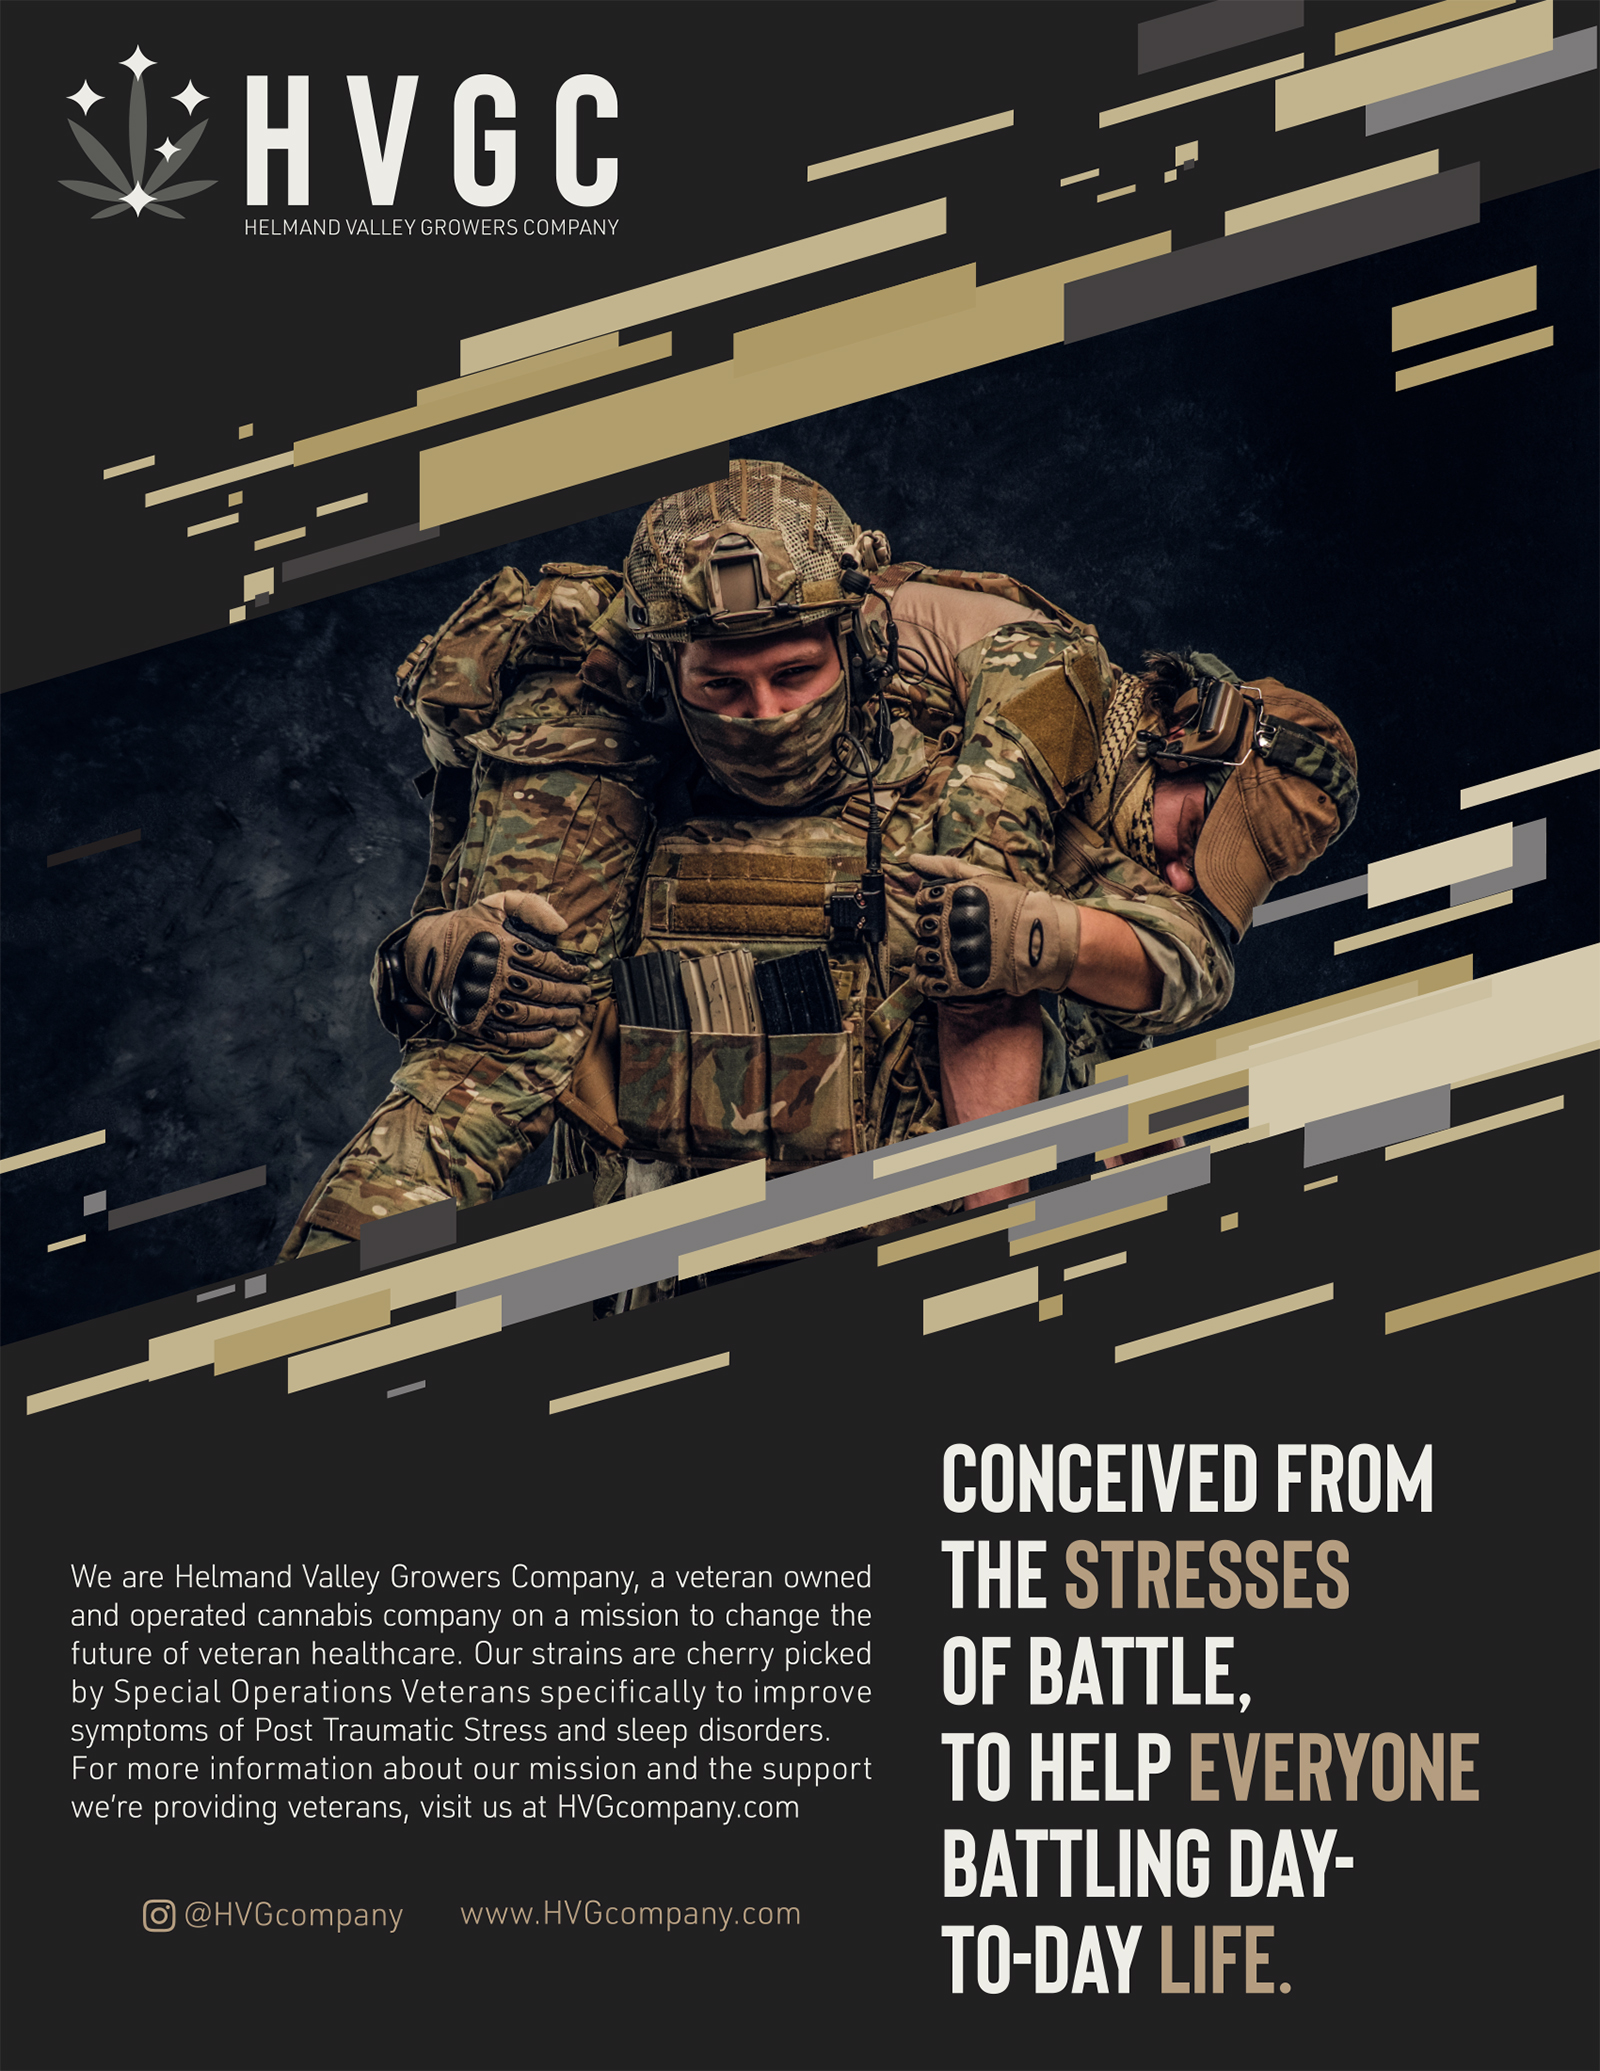 https://homelandmagazine.com/wp-content/uploads/2020/06/HVGC_PTS_Ad.jpg